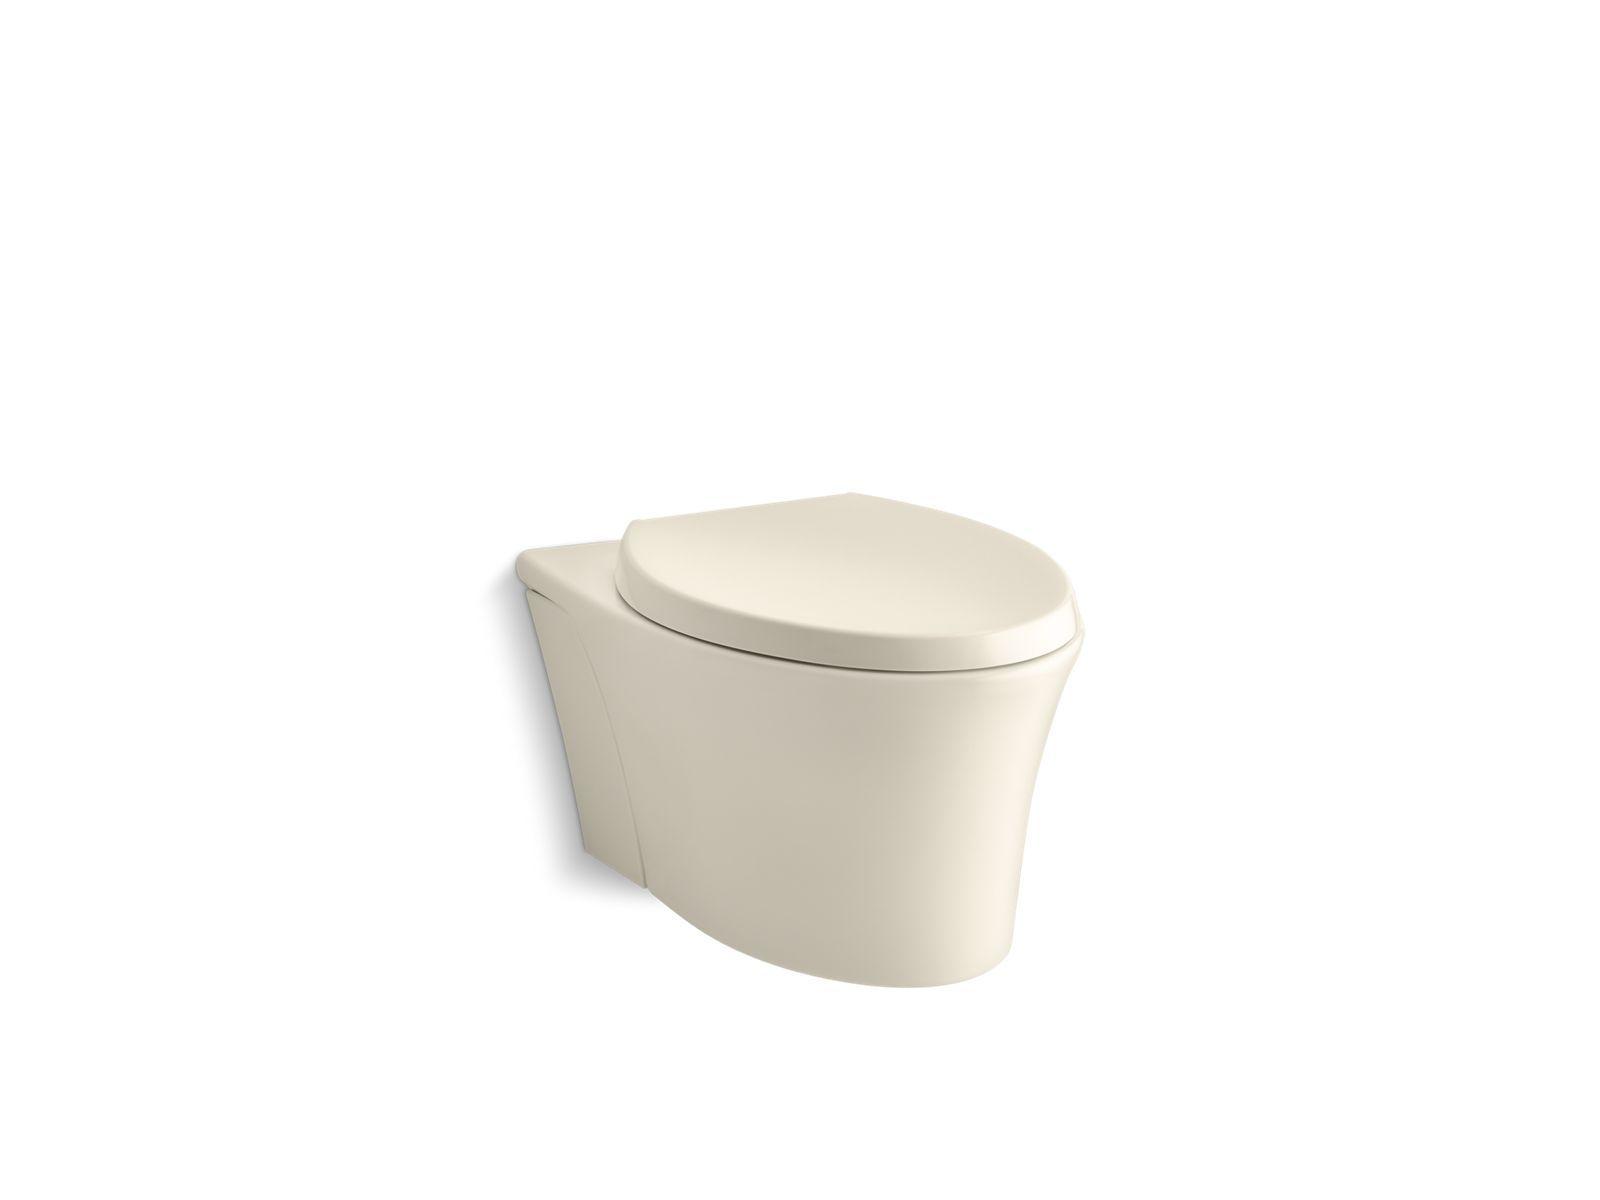 Best 25 Kohler Veil Ideas On Pinterest Dream Bathrooms Interiors Inside Ideas Interiors design about Everything [magnanprojects.com]